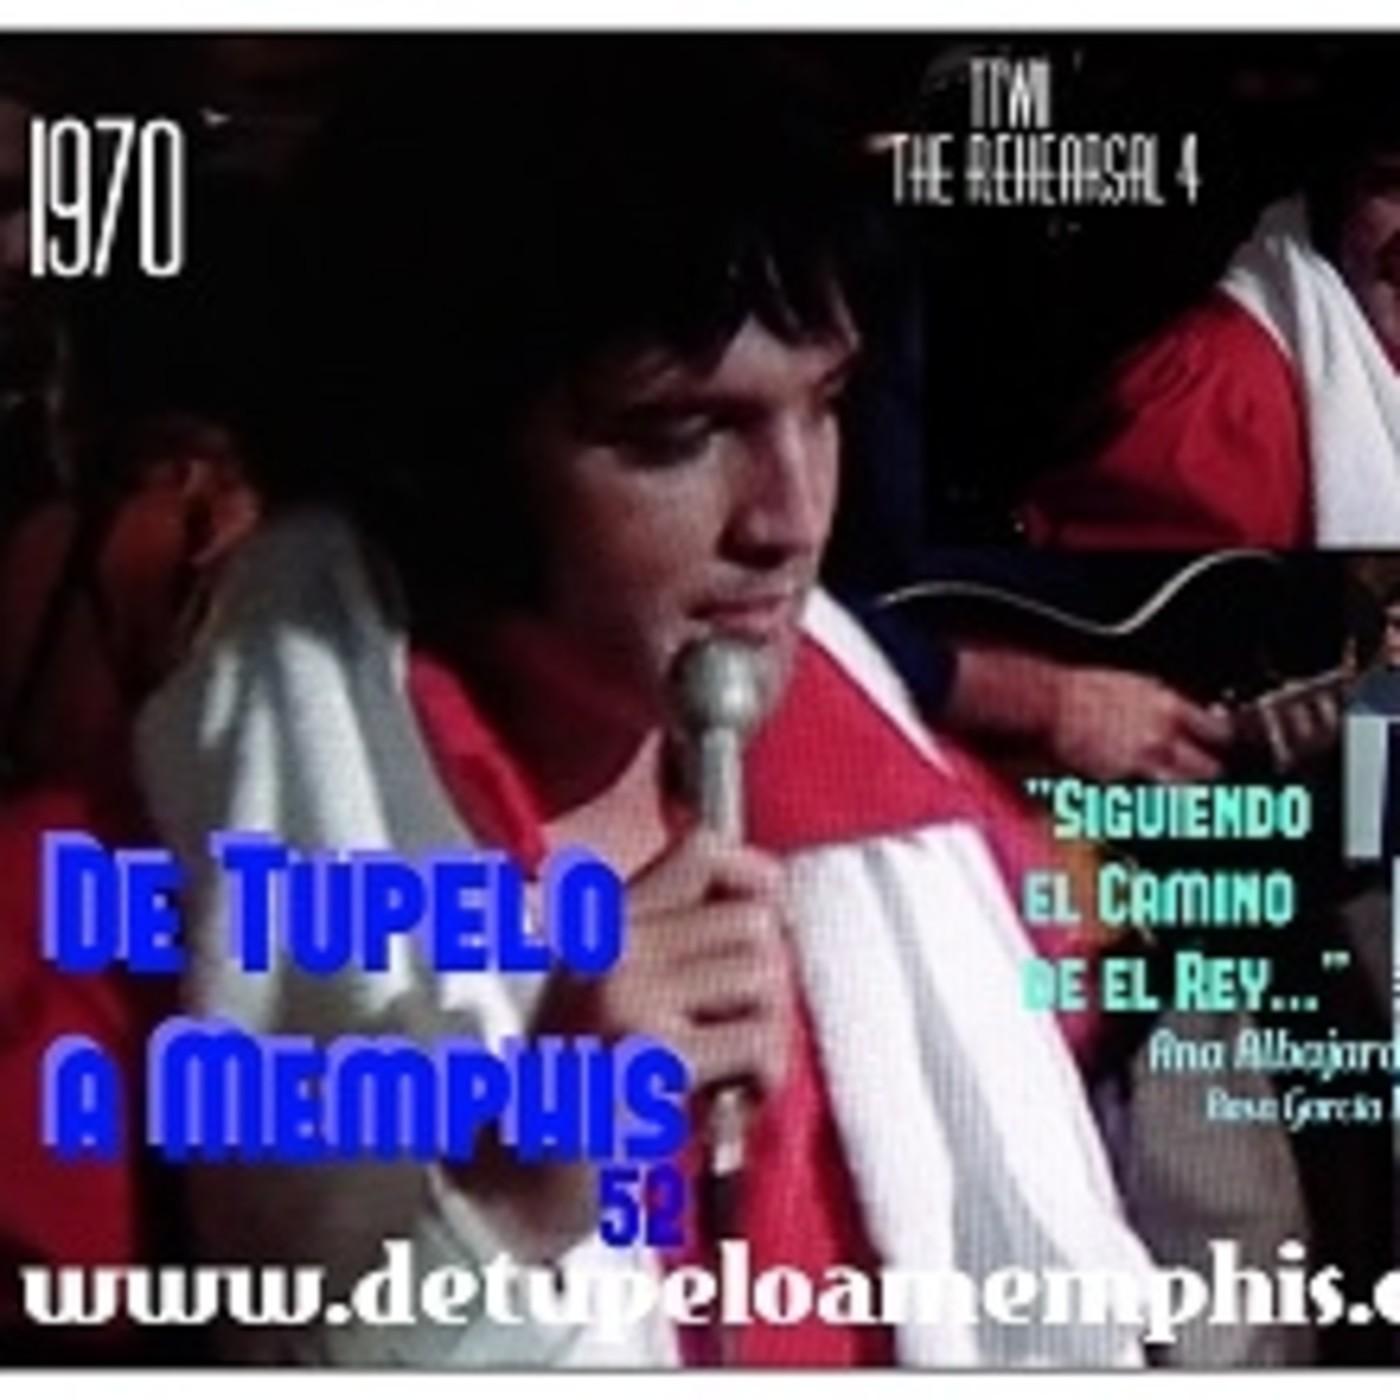 De Tupelo a Memphis 52 TTWII The Rehearsal 4